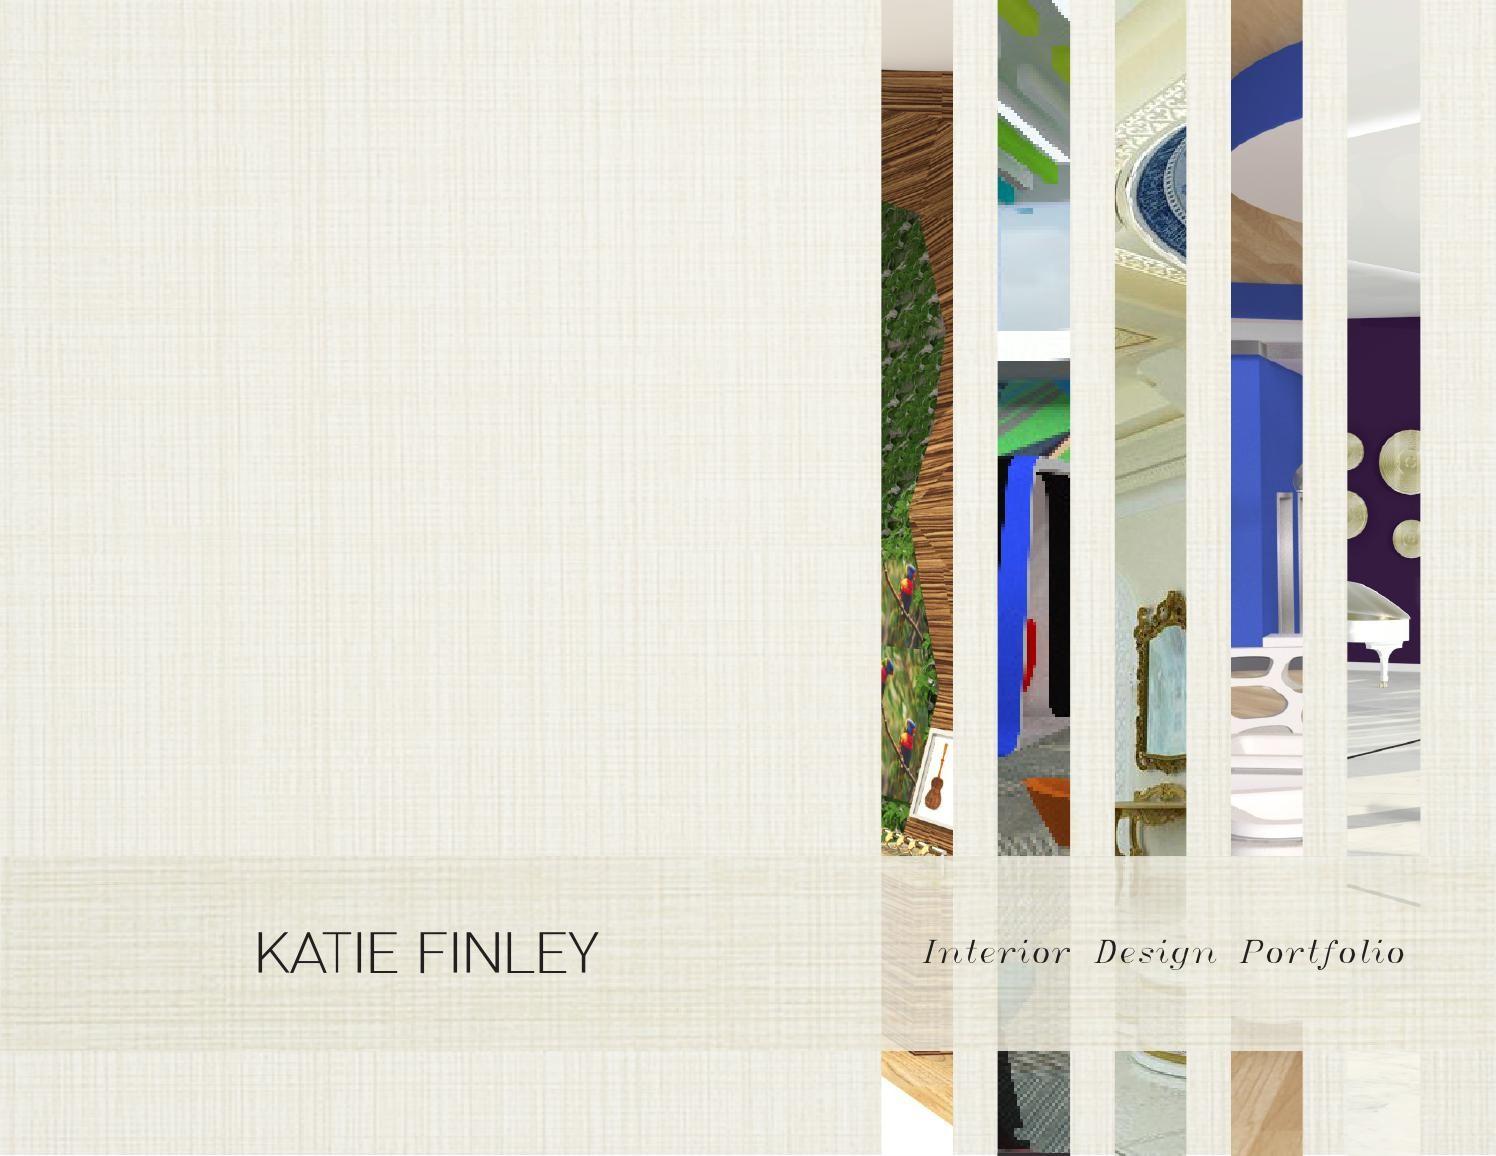 Interior Design Portfolio Katie Finley Interior Design Portfolios Design Portfolios And